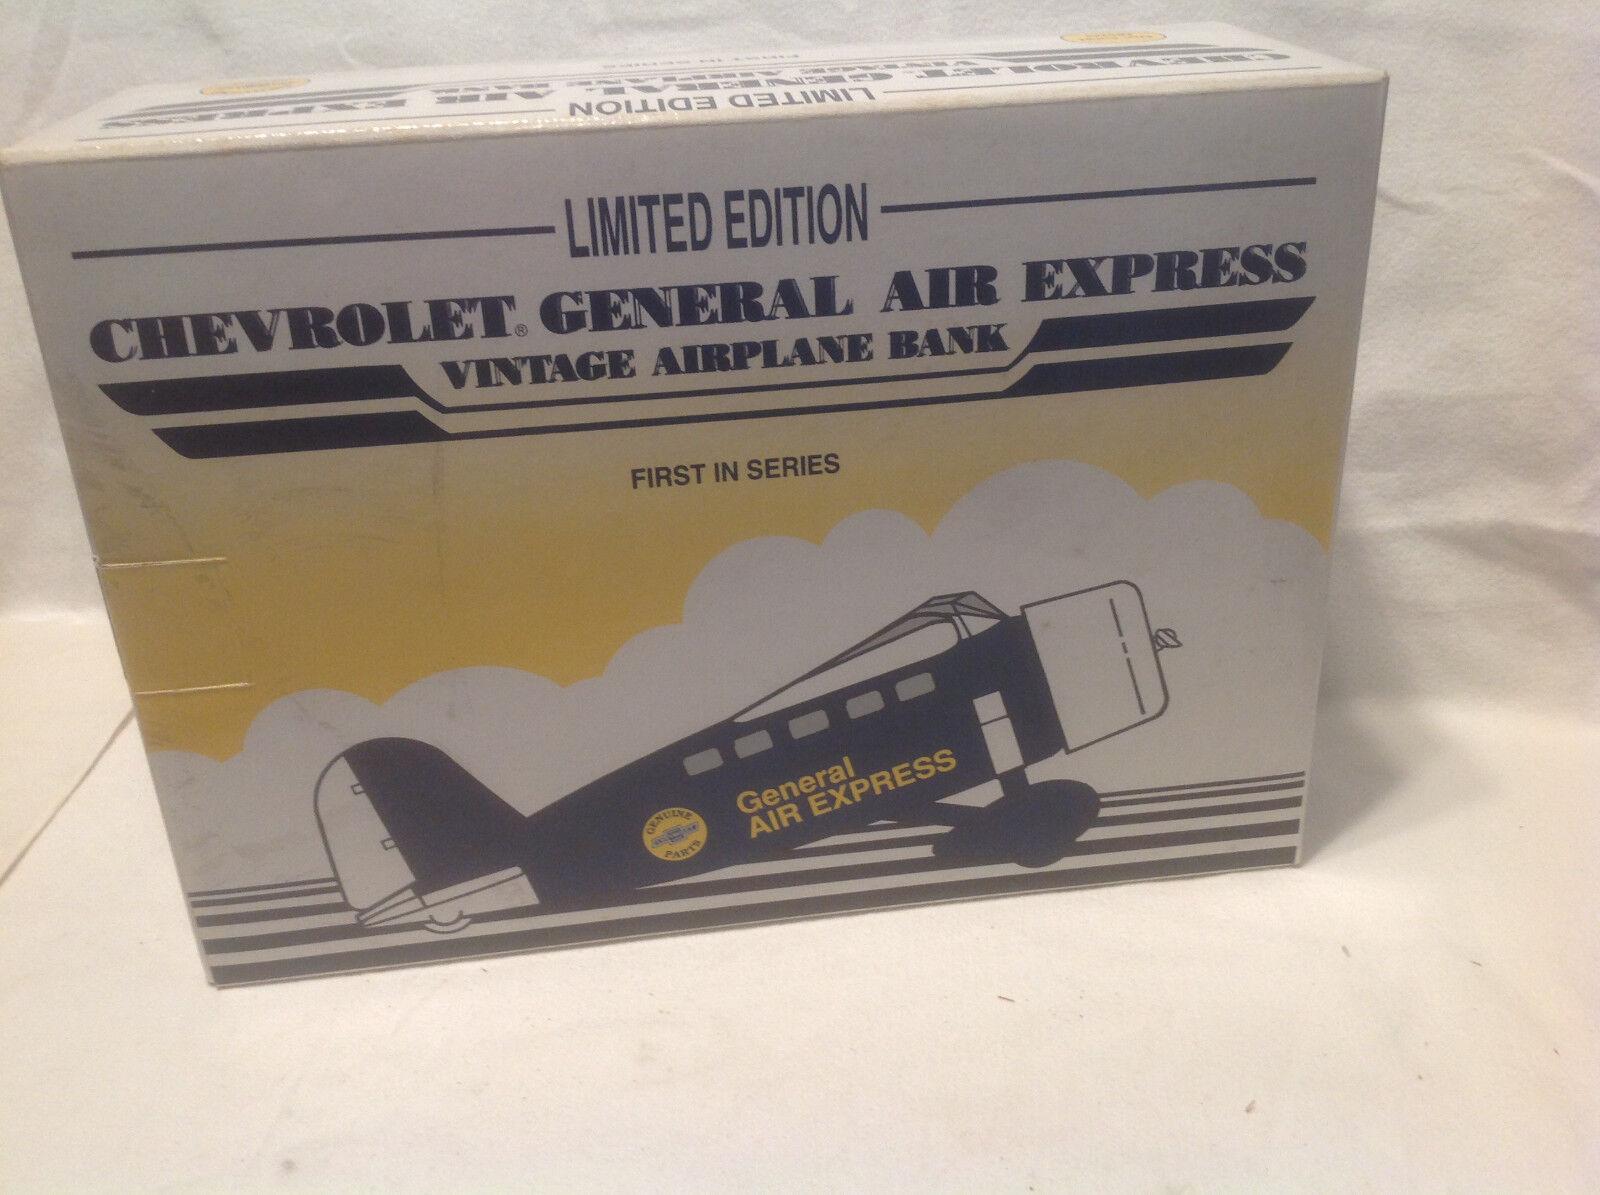 AIRPLANE CHEVROLET GENERAL AIR AIR AIR EXPRESS VINTAGE AIRPLANE BANK SPEC CAST 31bd82